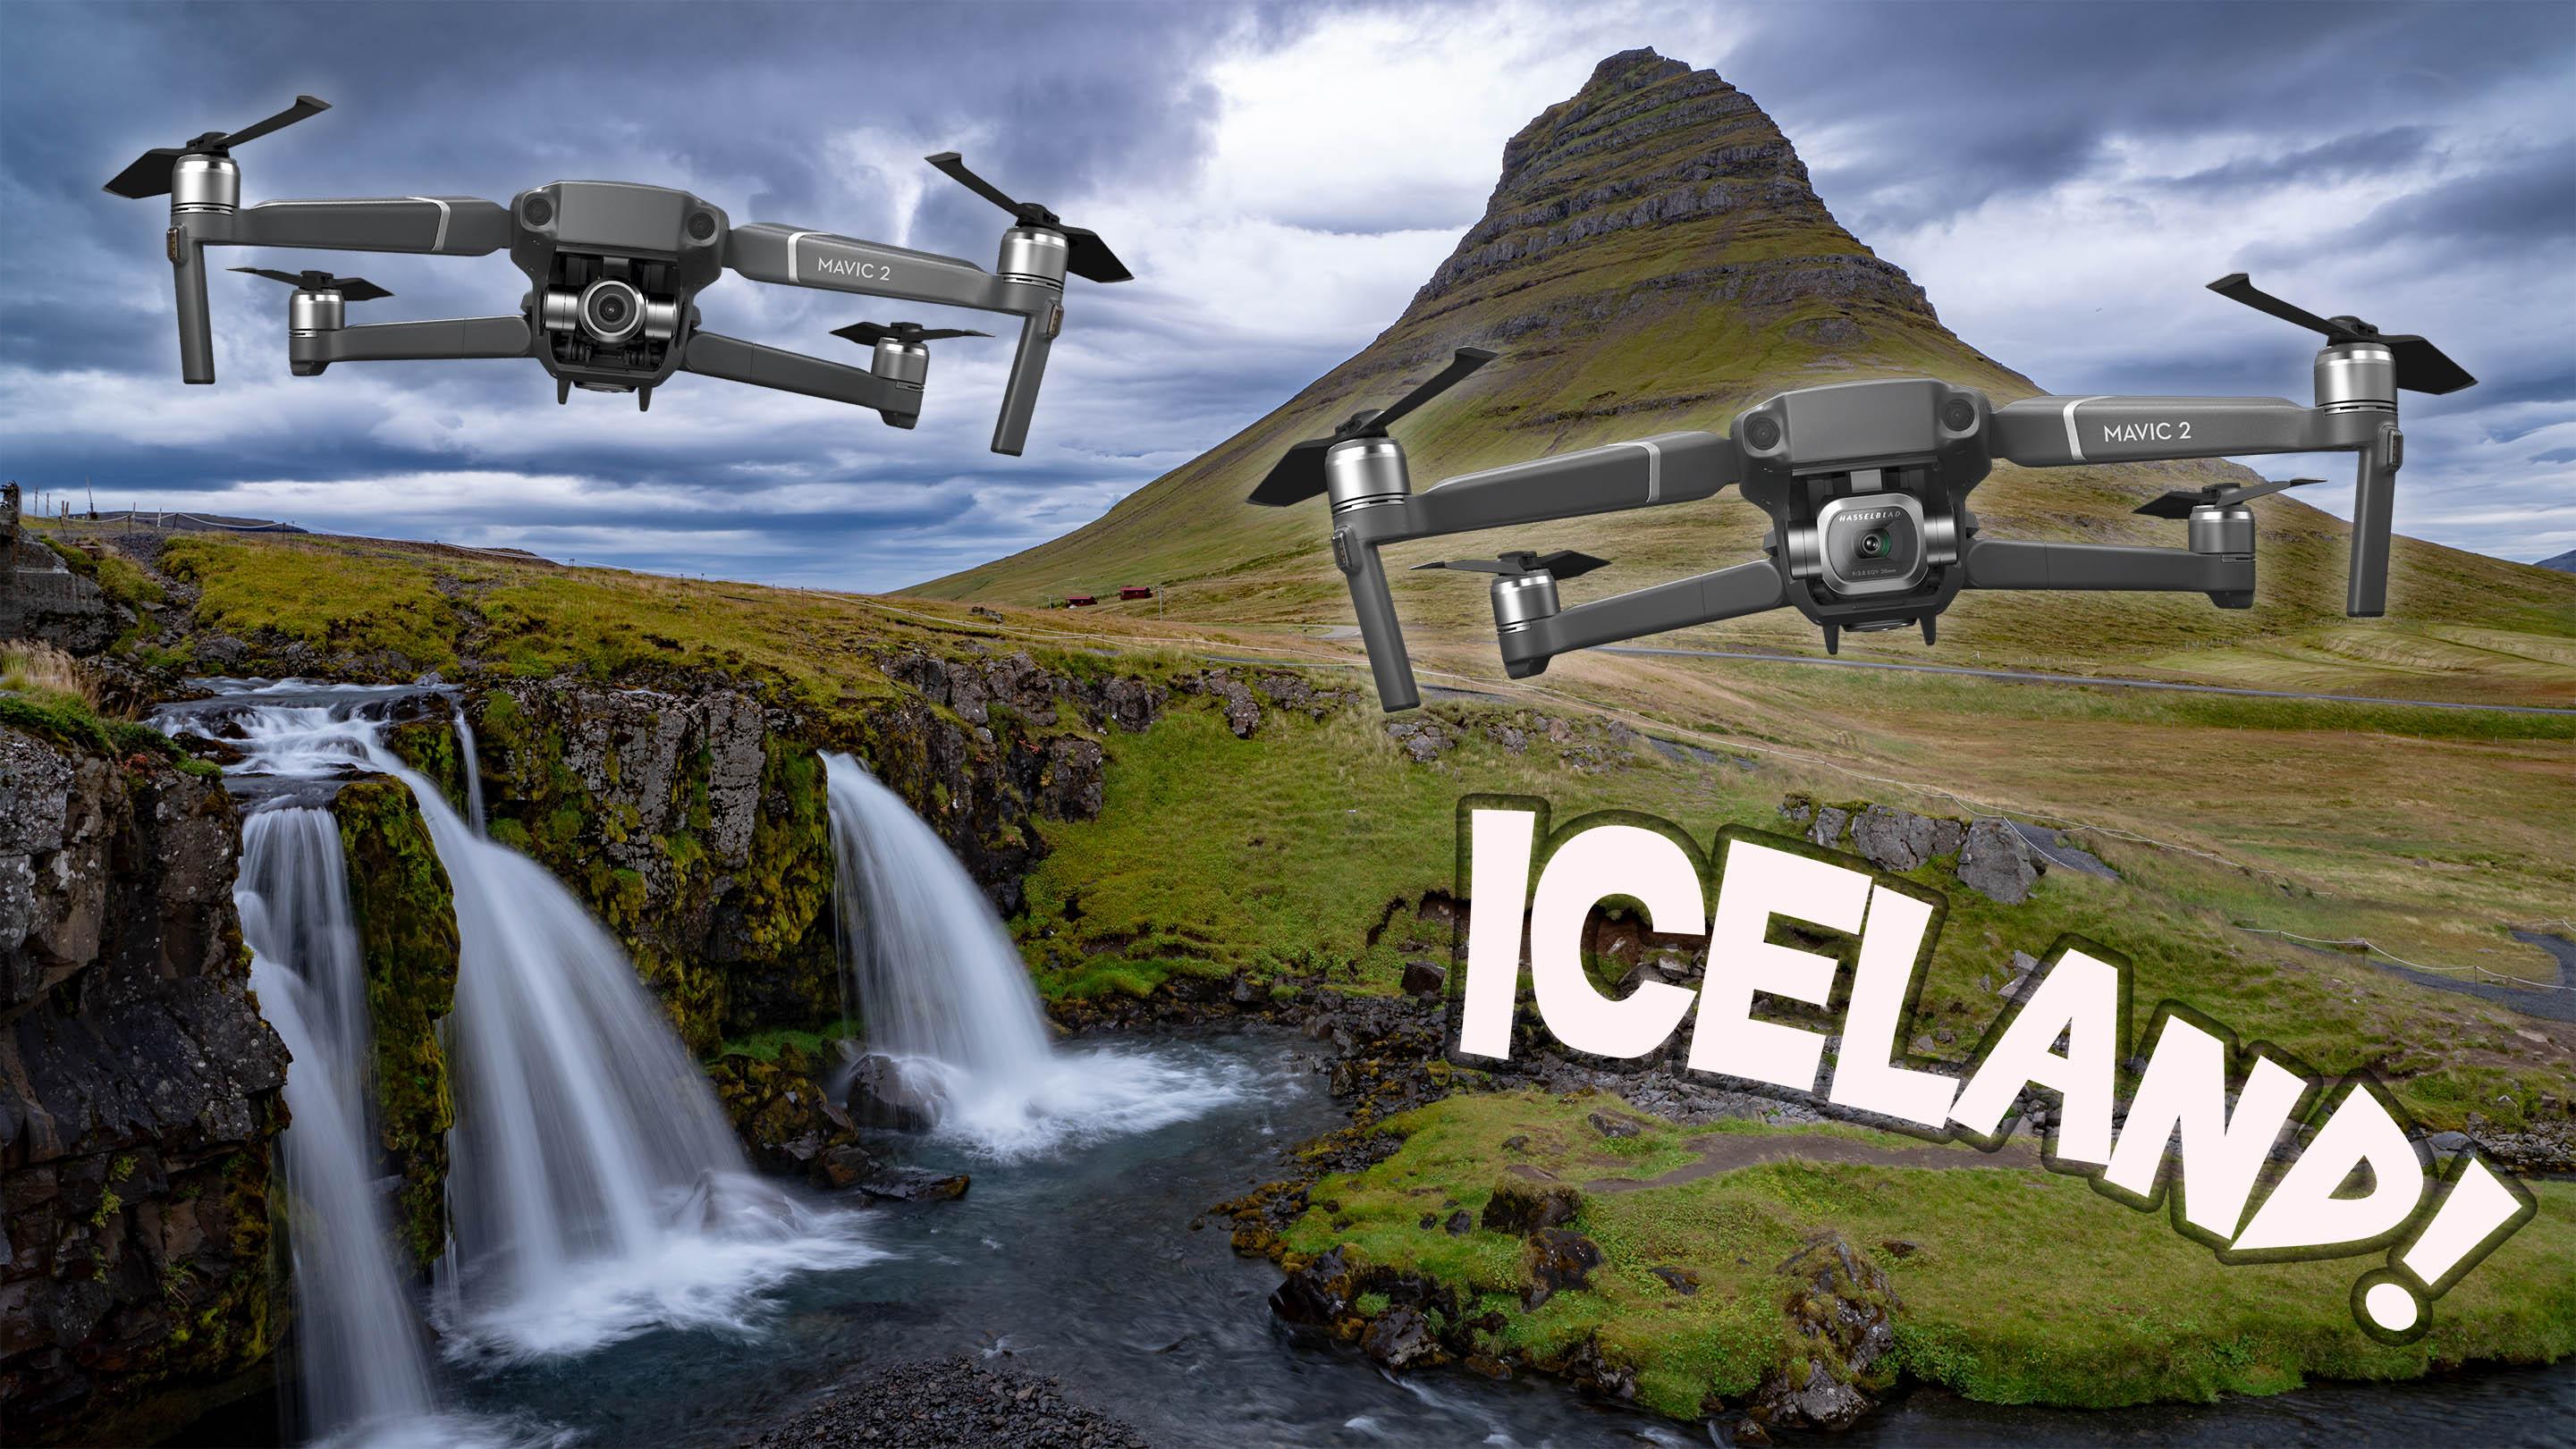 The Dji Mavic 2 Is Best Consumer Drone Yet Bh Explora Police Line Barricade Tape 3 Inch X 300 Meter M